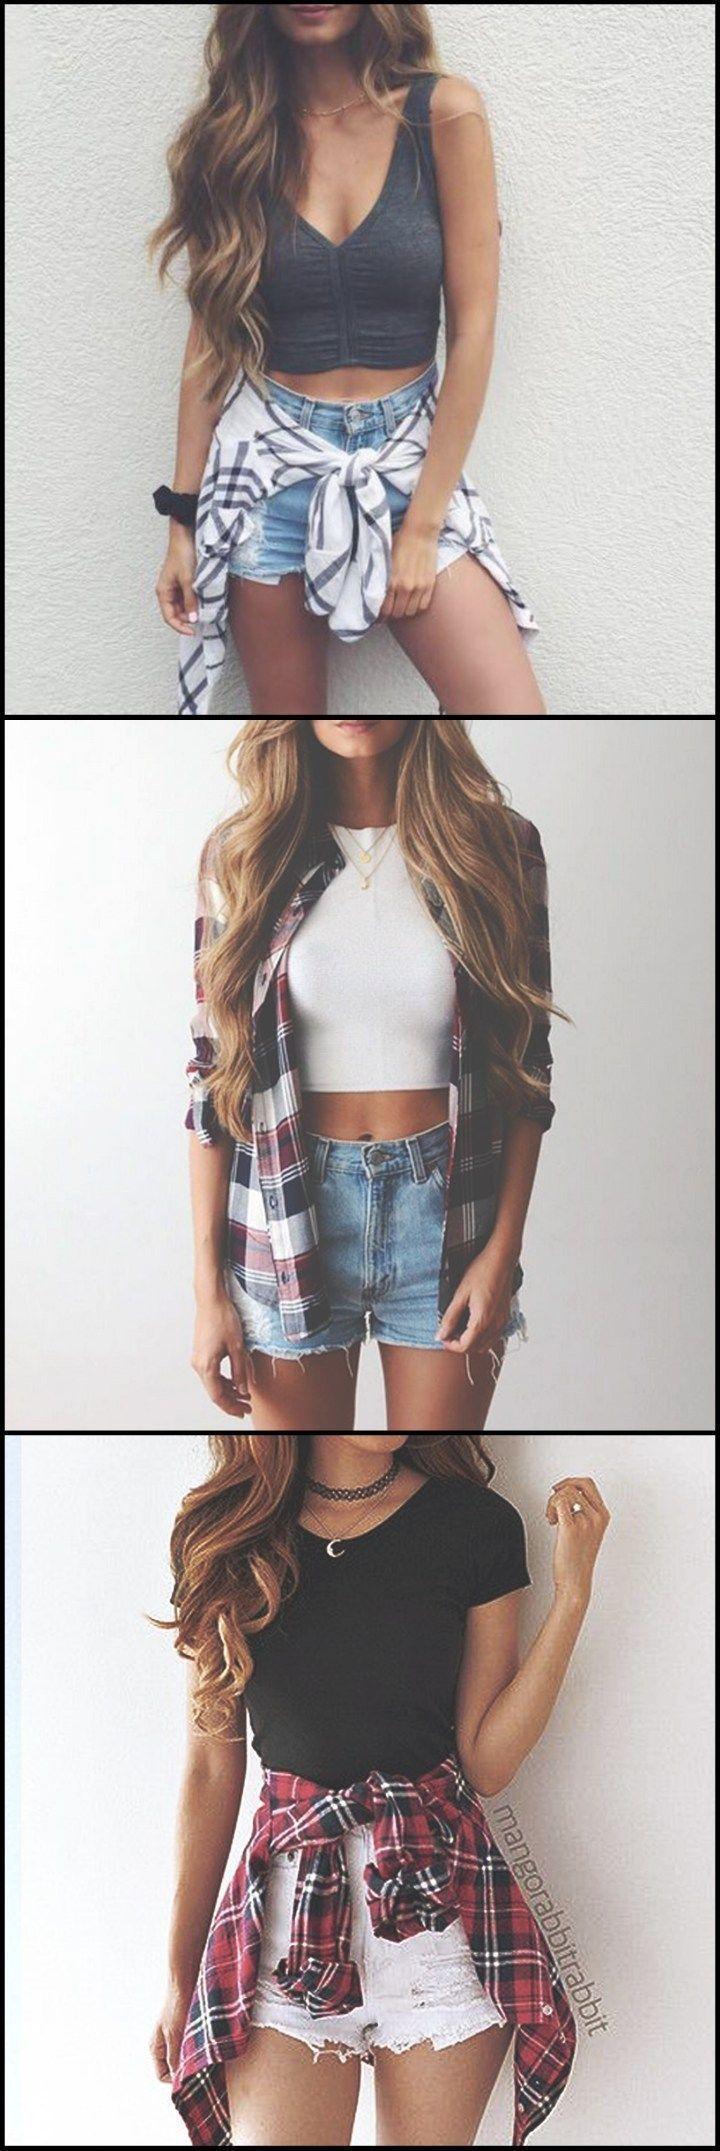 Süße Outfits Süße lässige Sommer-Outfit-Ideen für Teenager 2017 Flanell Plaid High #LässigesOutfit